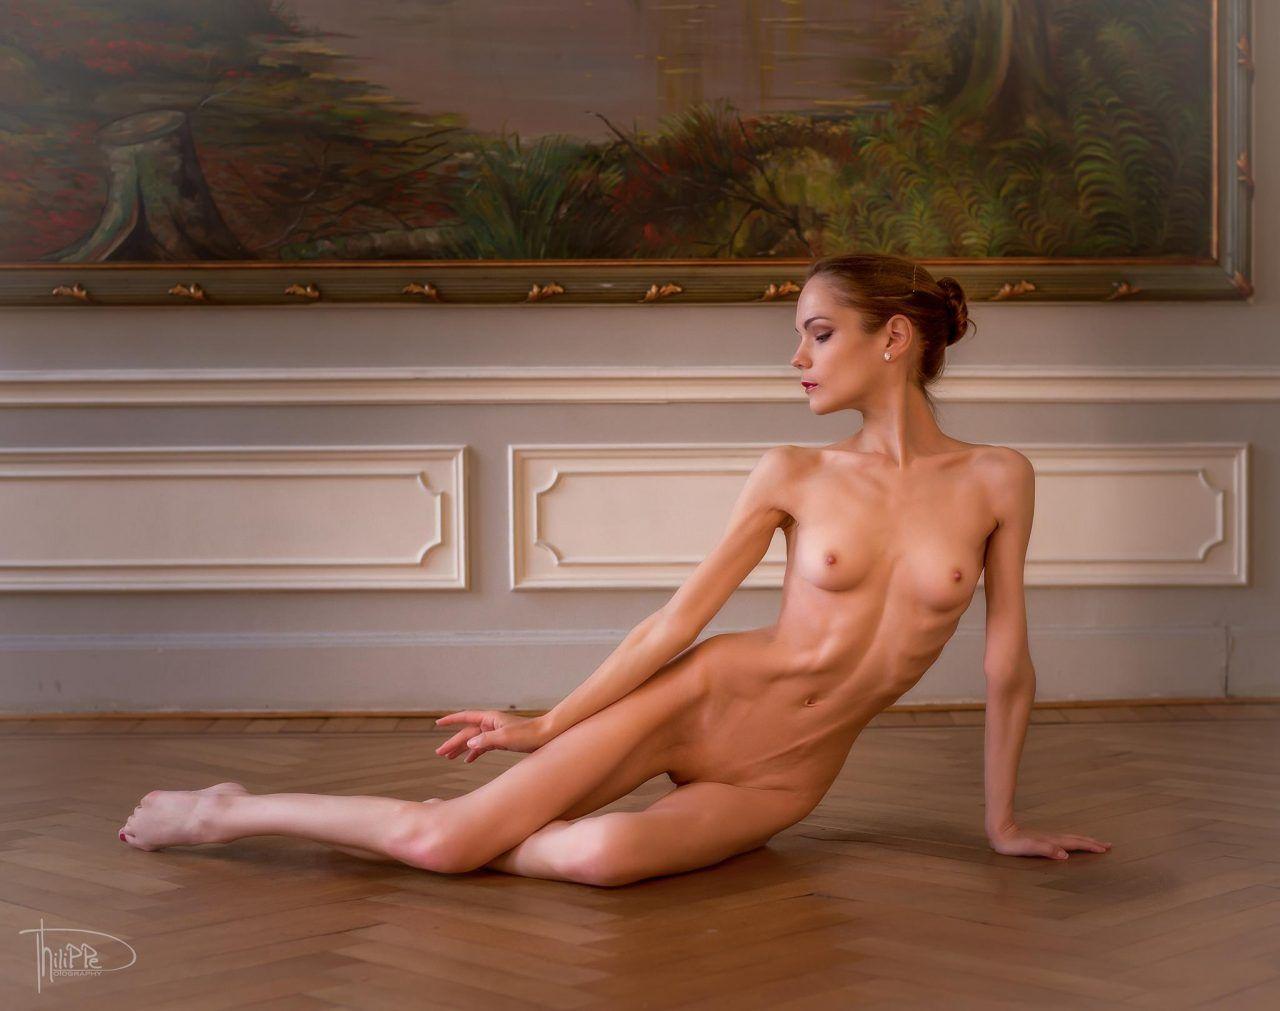 Since ballerina nude — img 2